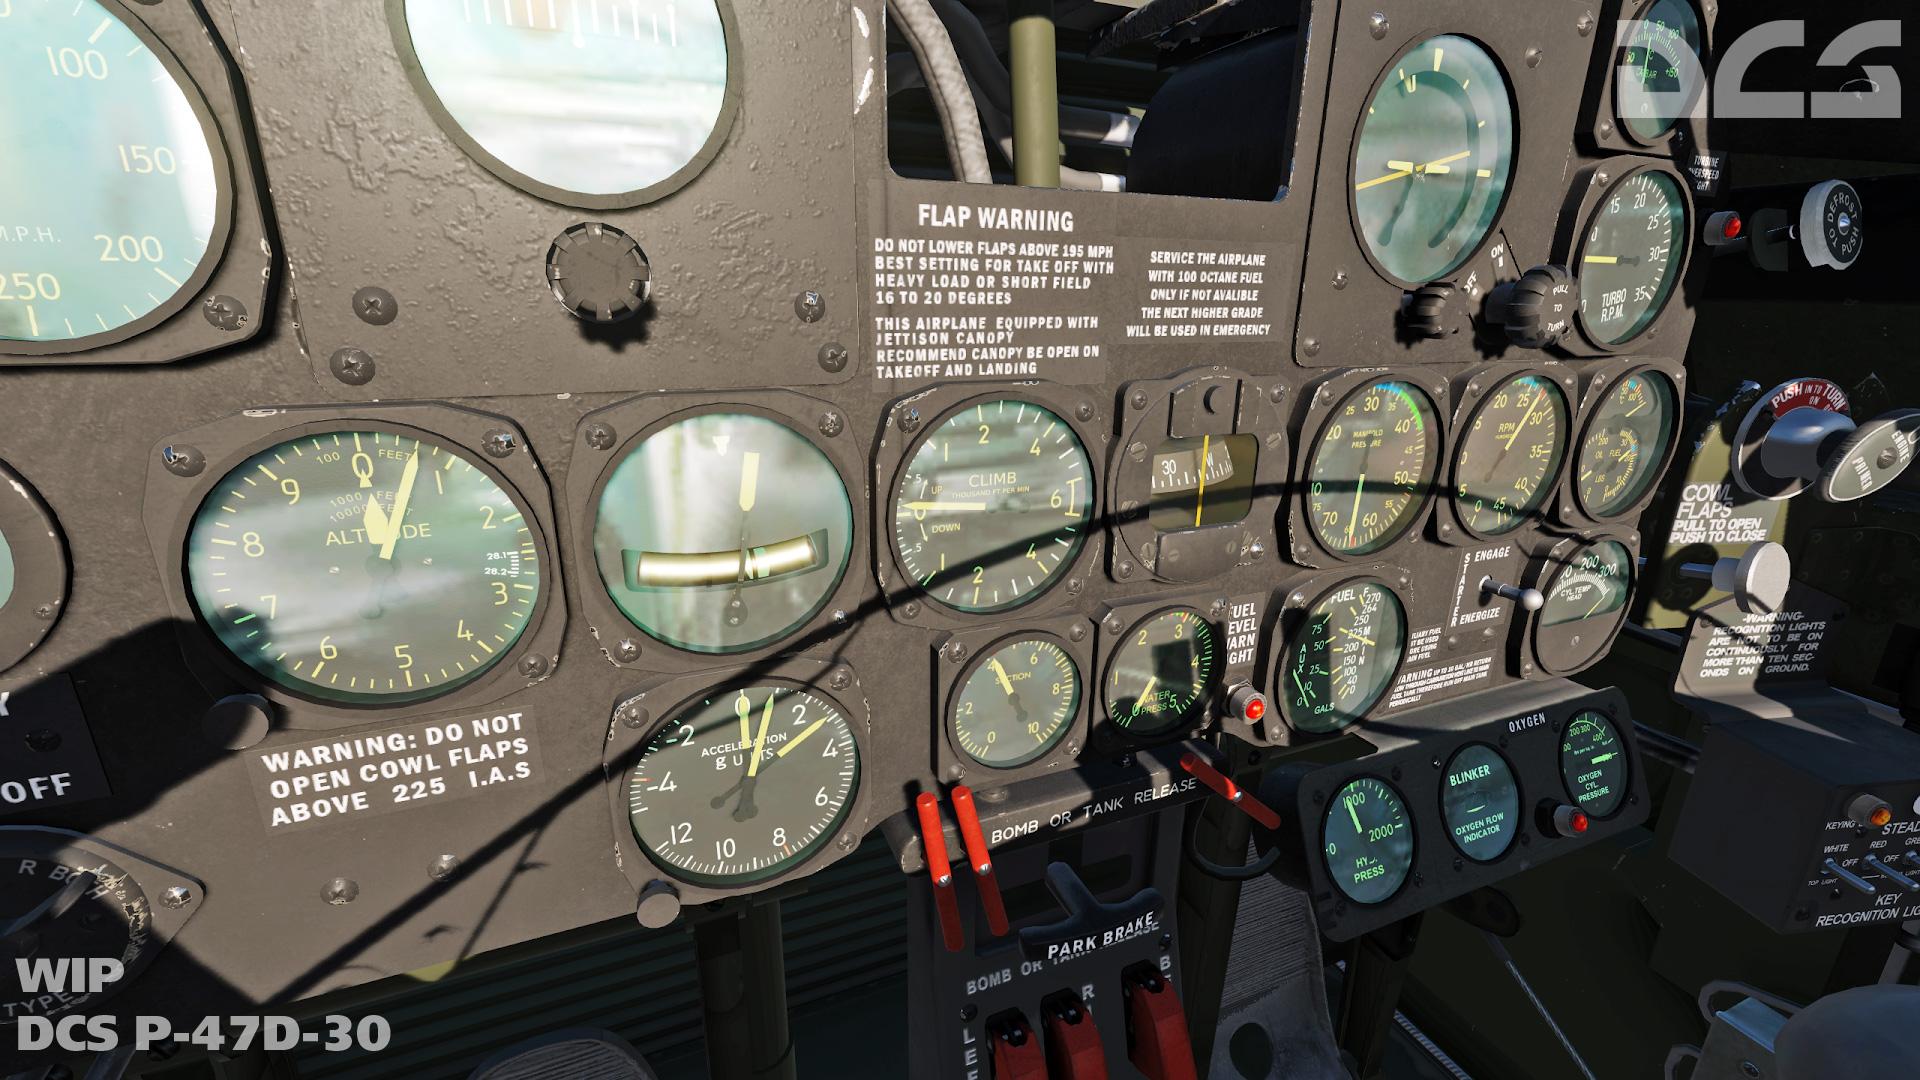 www.digitalcombatsimulator.com/upload/iblock/7ac/2020-01-31-P-47-11.jpg